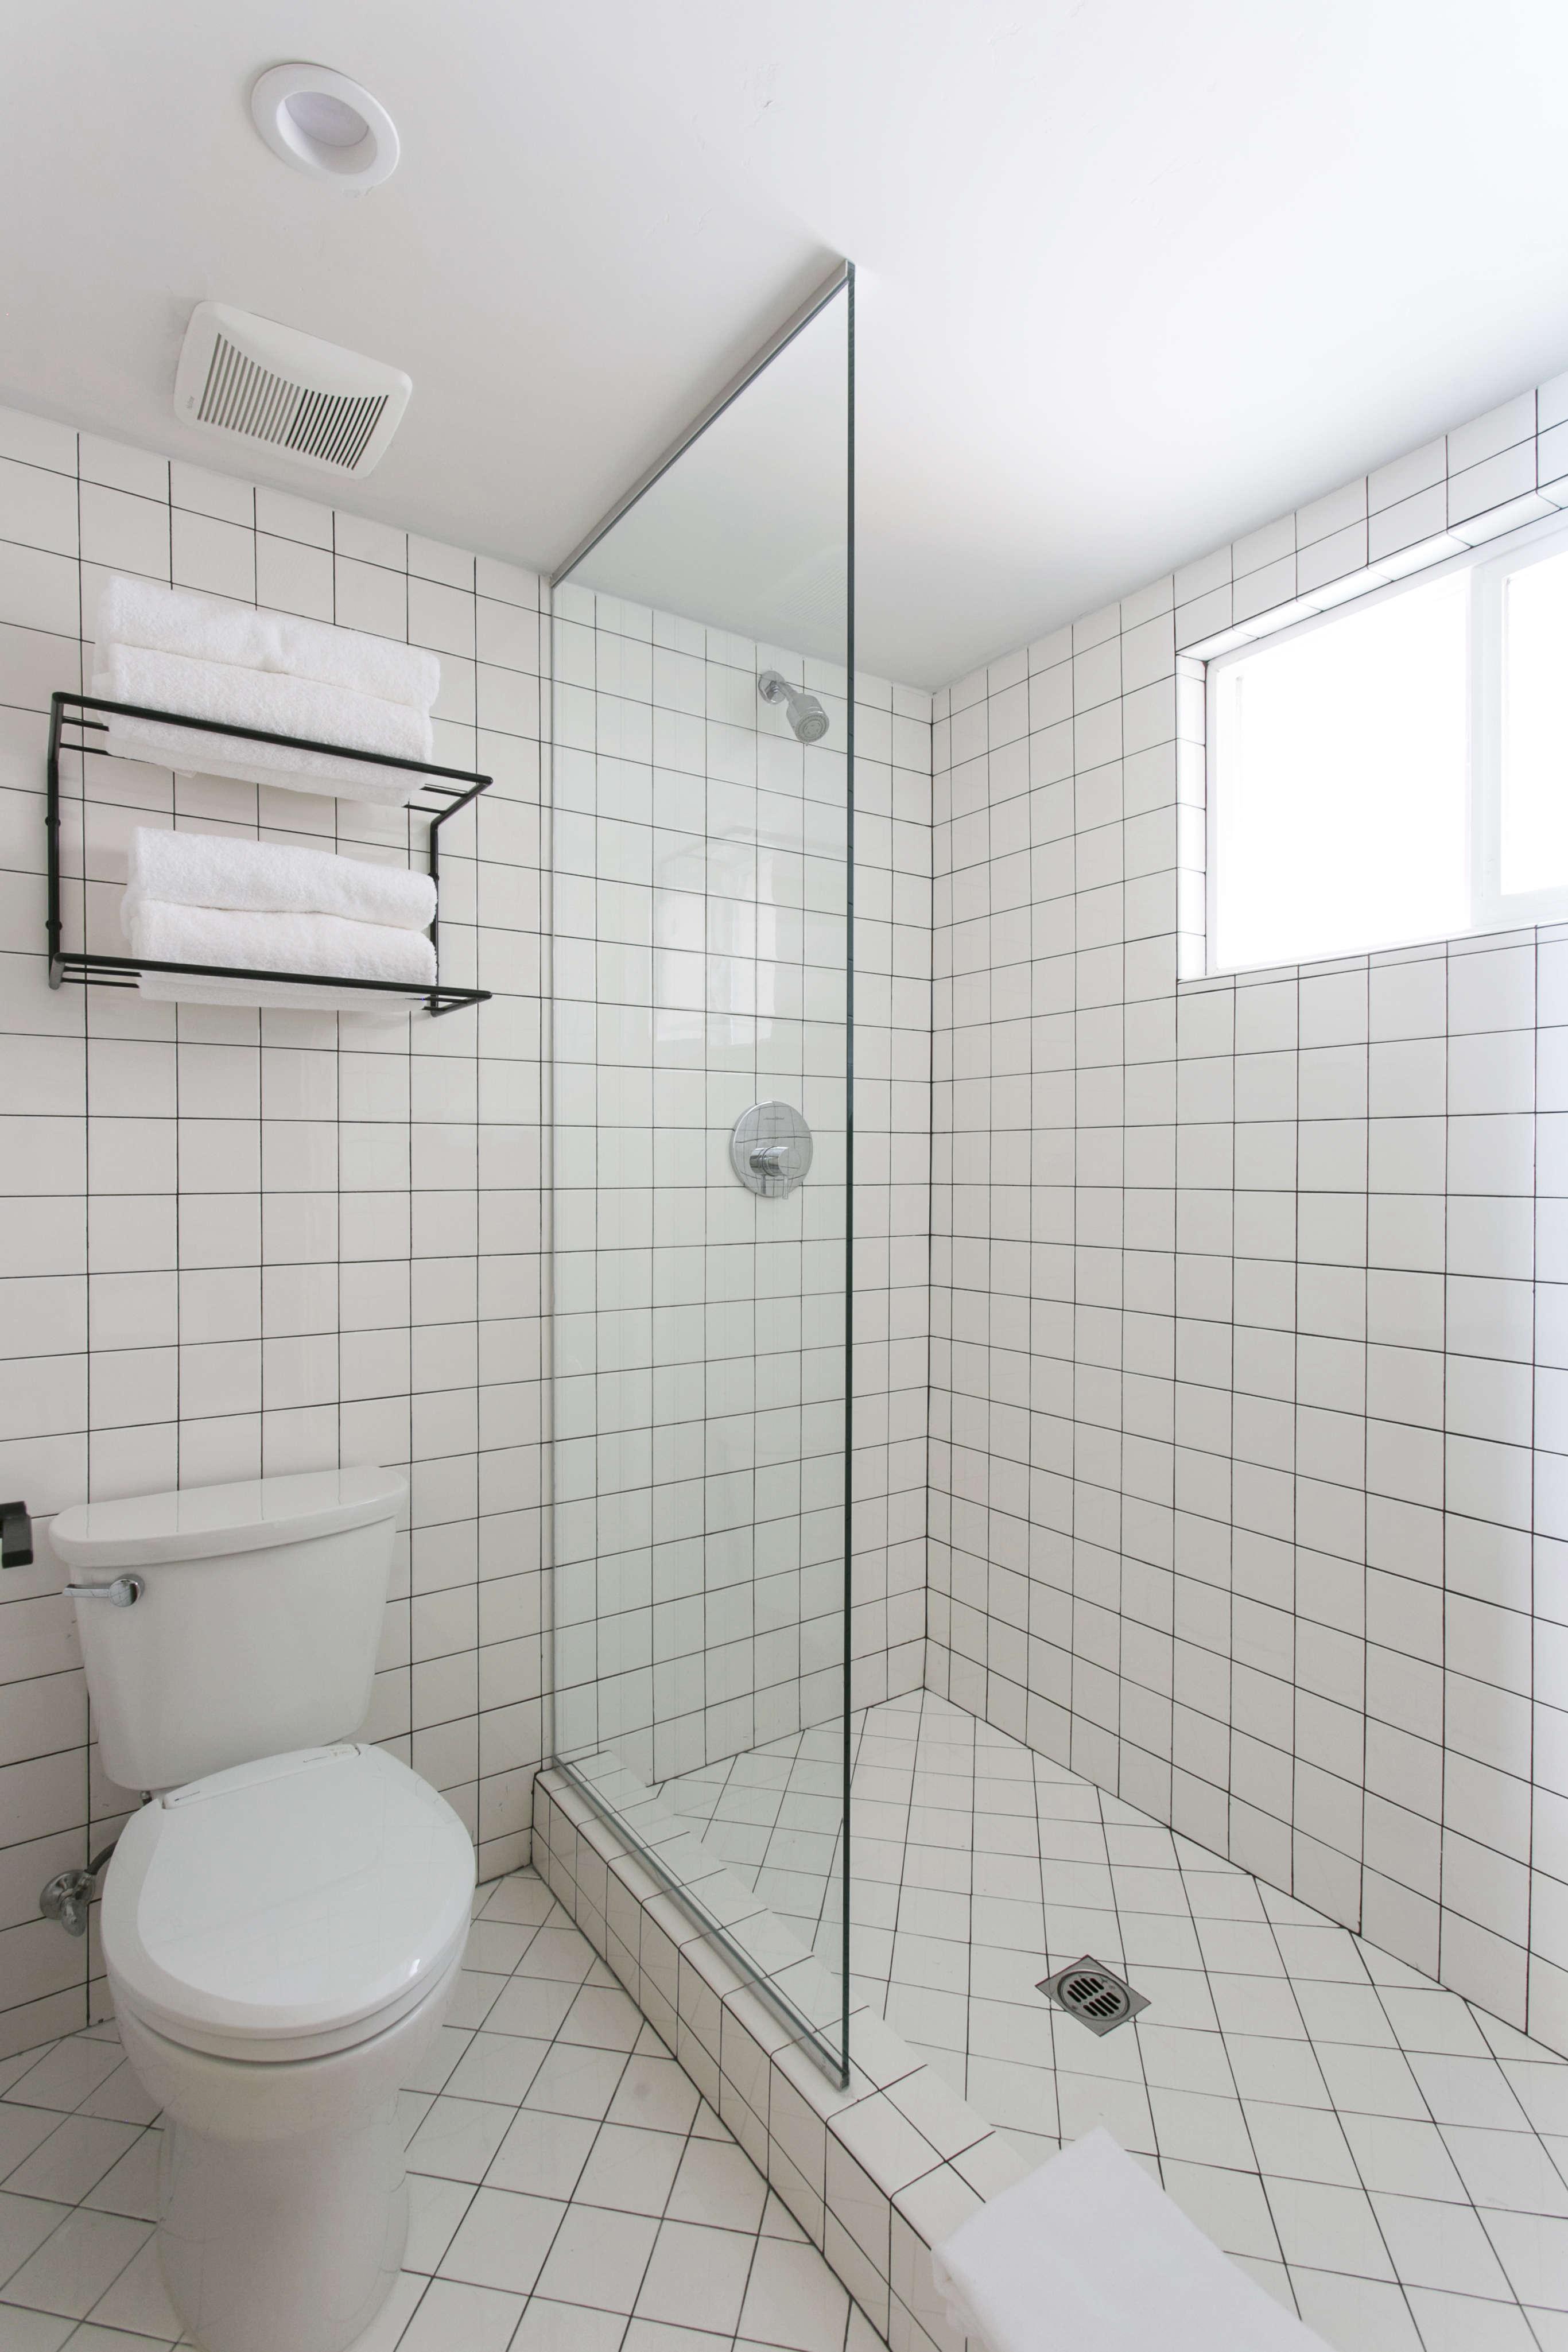 all-white-tile-bath-black-grout-coachman-hotel